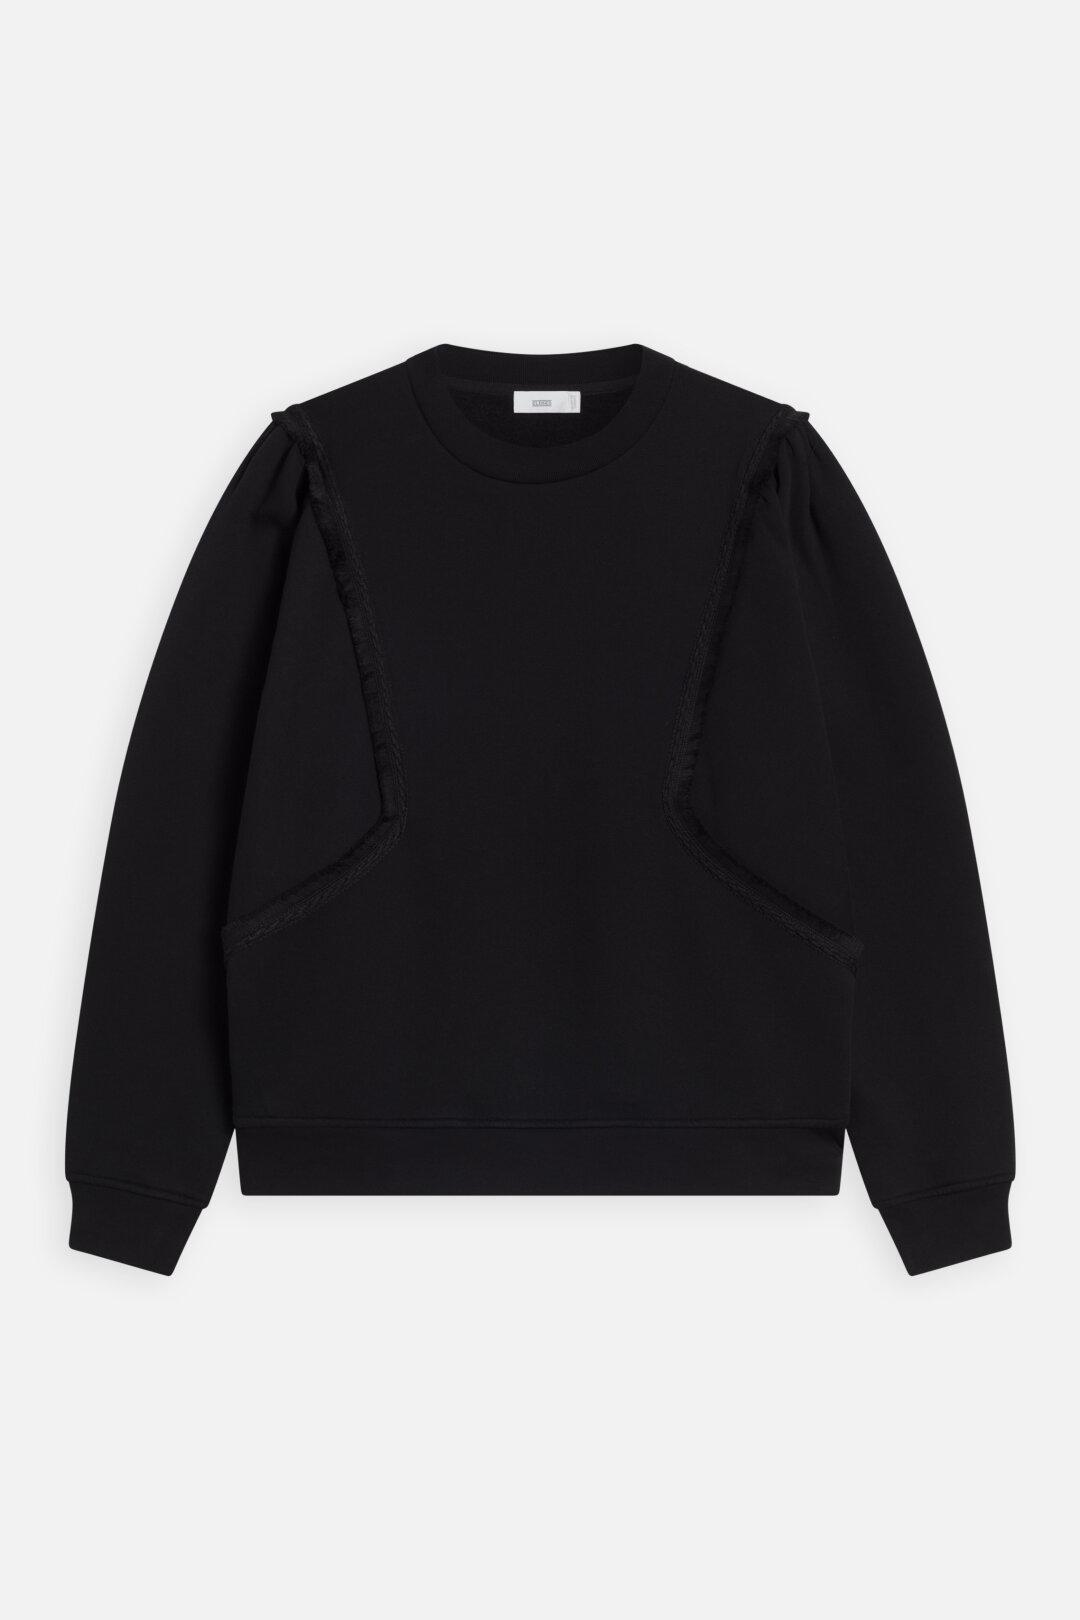 Sweatshirt, Closed, Black, C95060